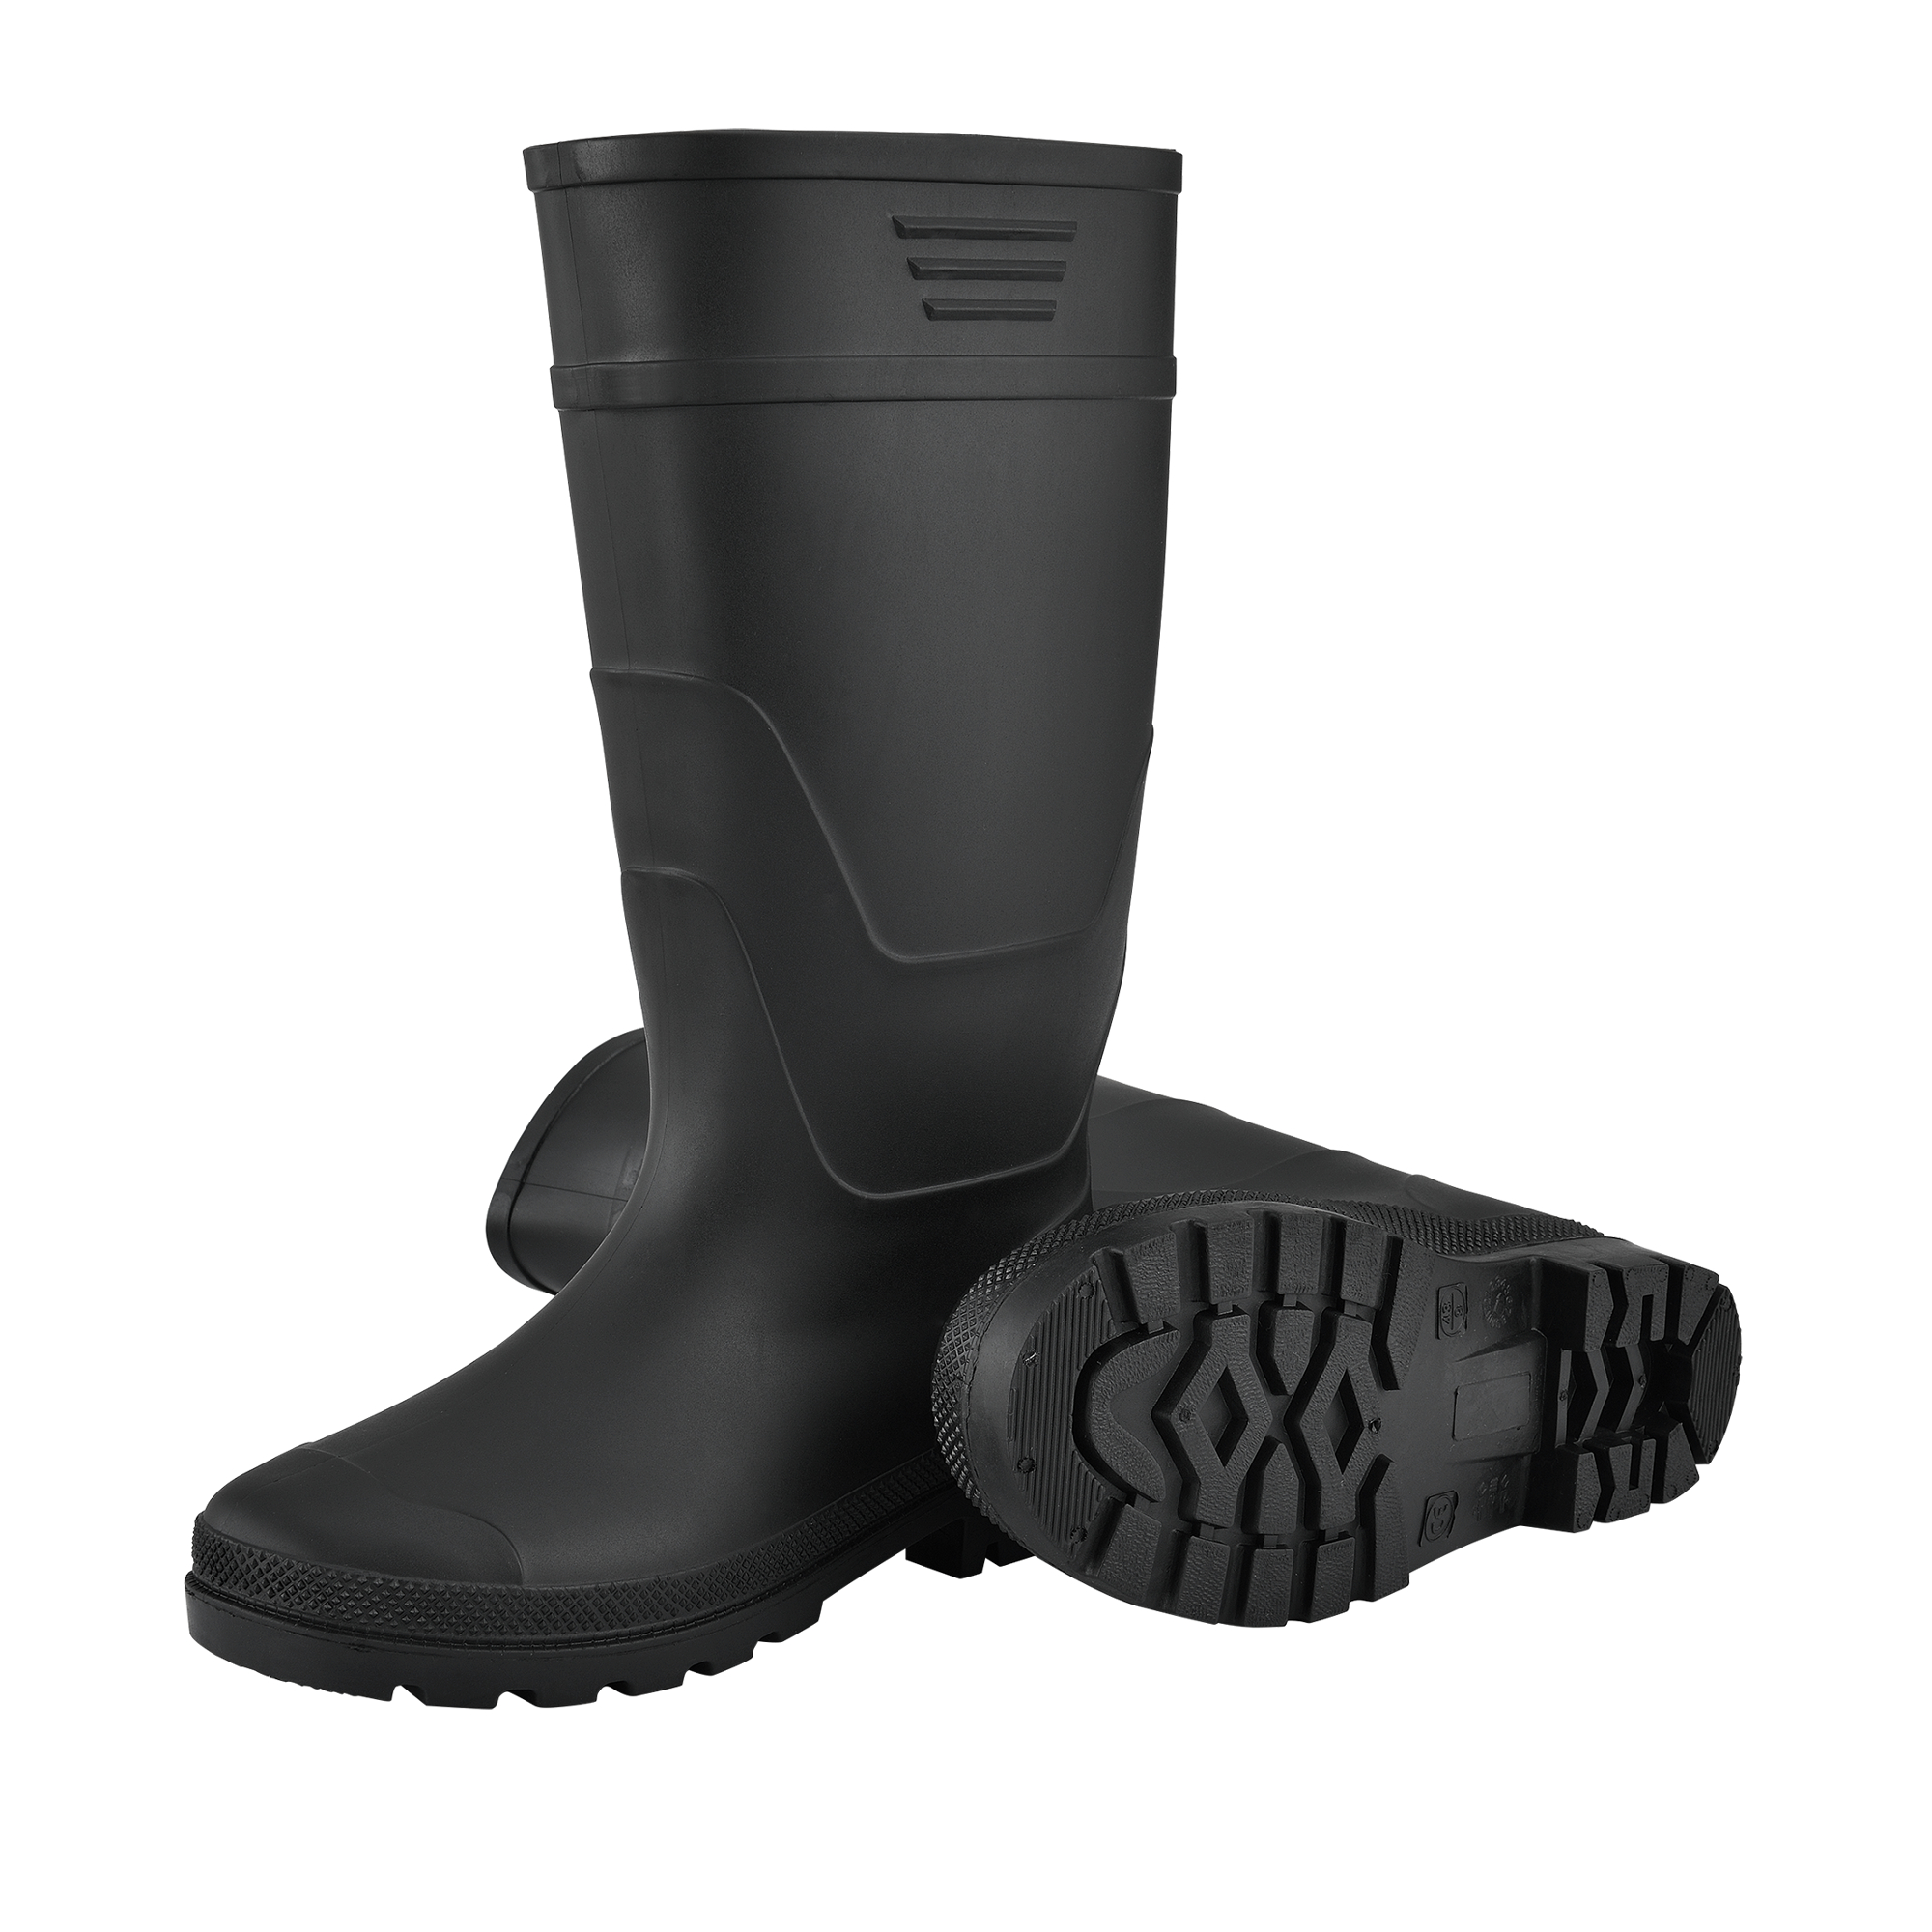 46 Gummistiefel Anglerstiefel Regenstiefel Stiefel PVC Schwarz Gr